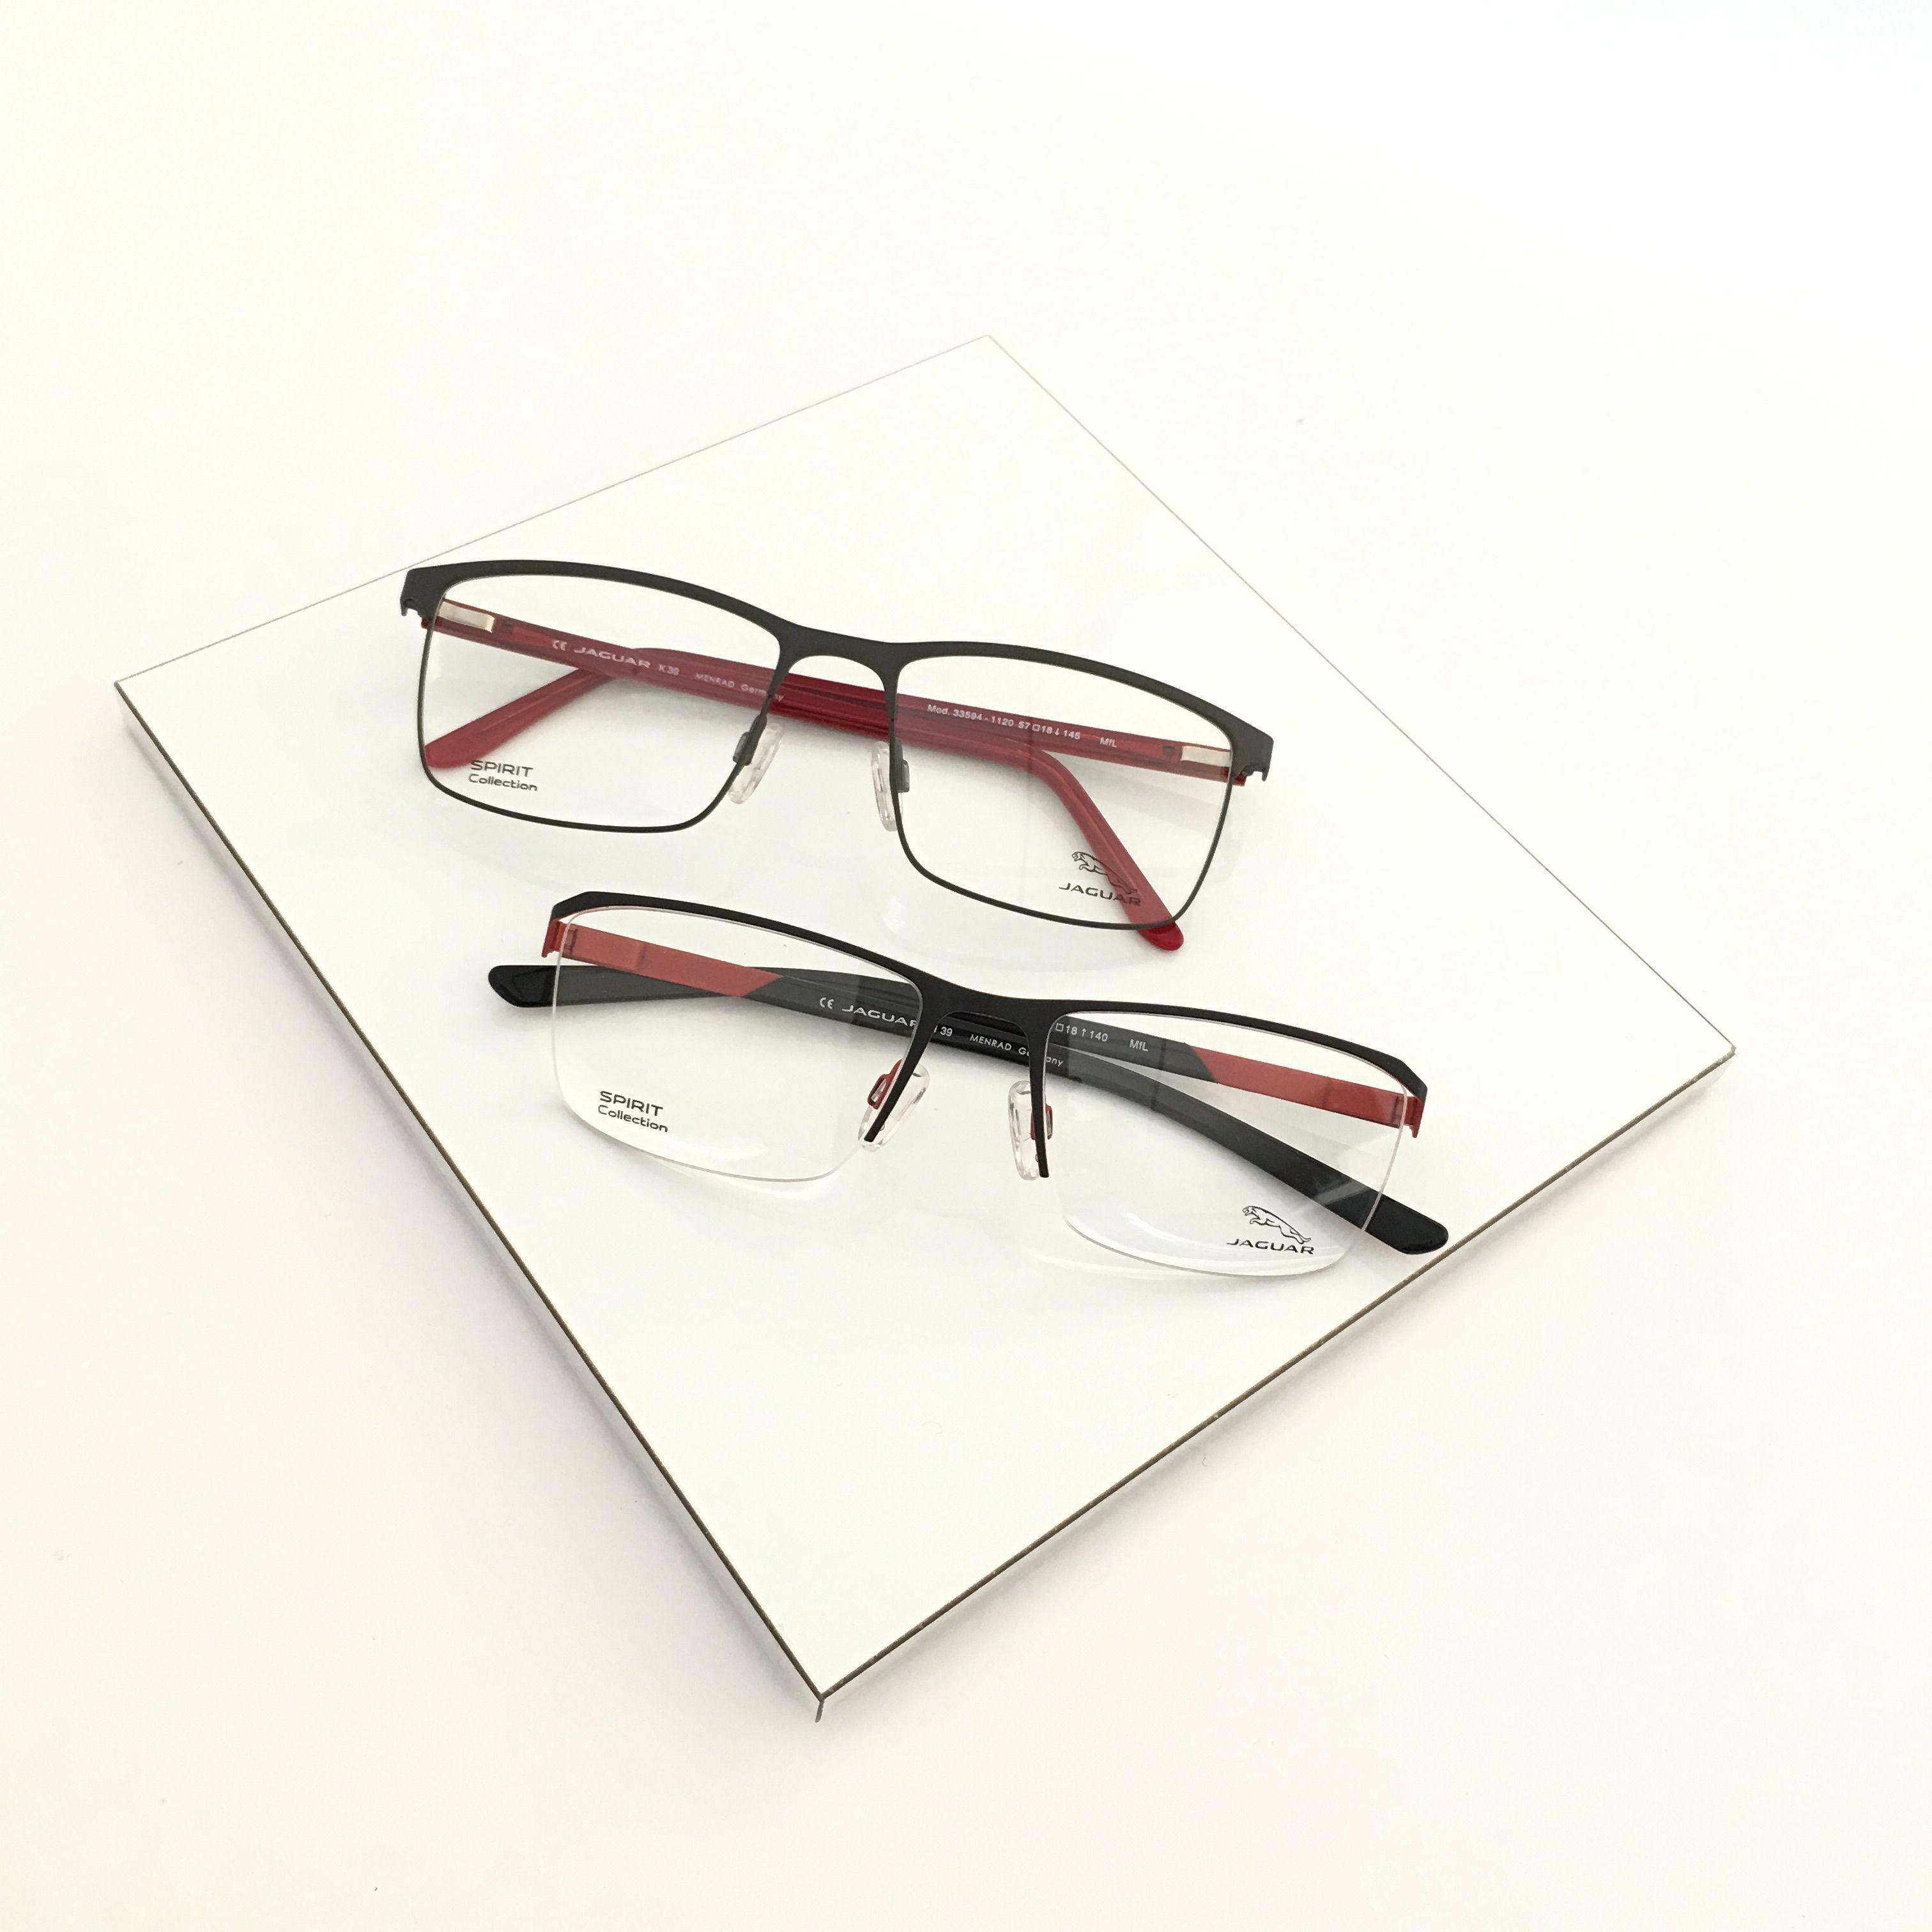 stone eyewear barnard charles levit brands glasses jaguar all